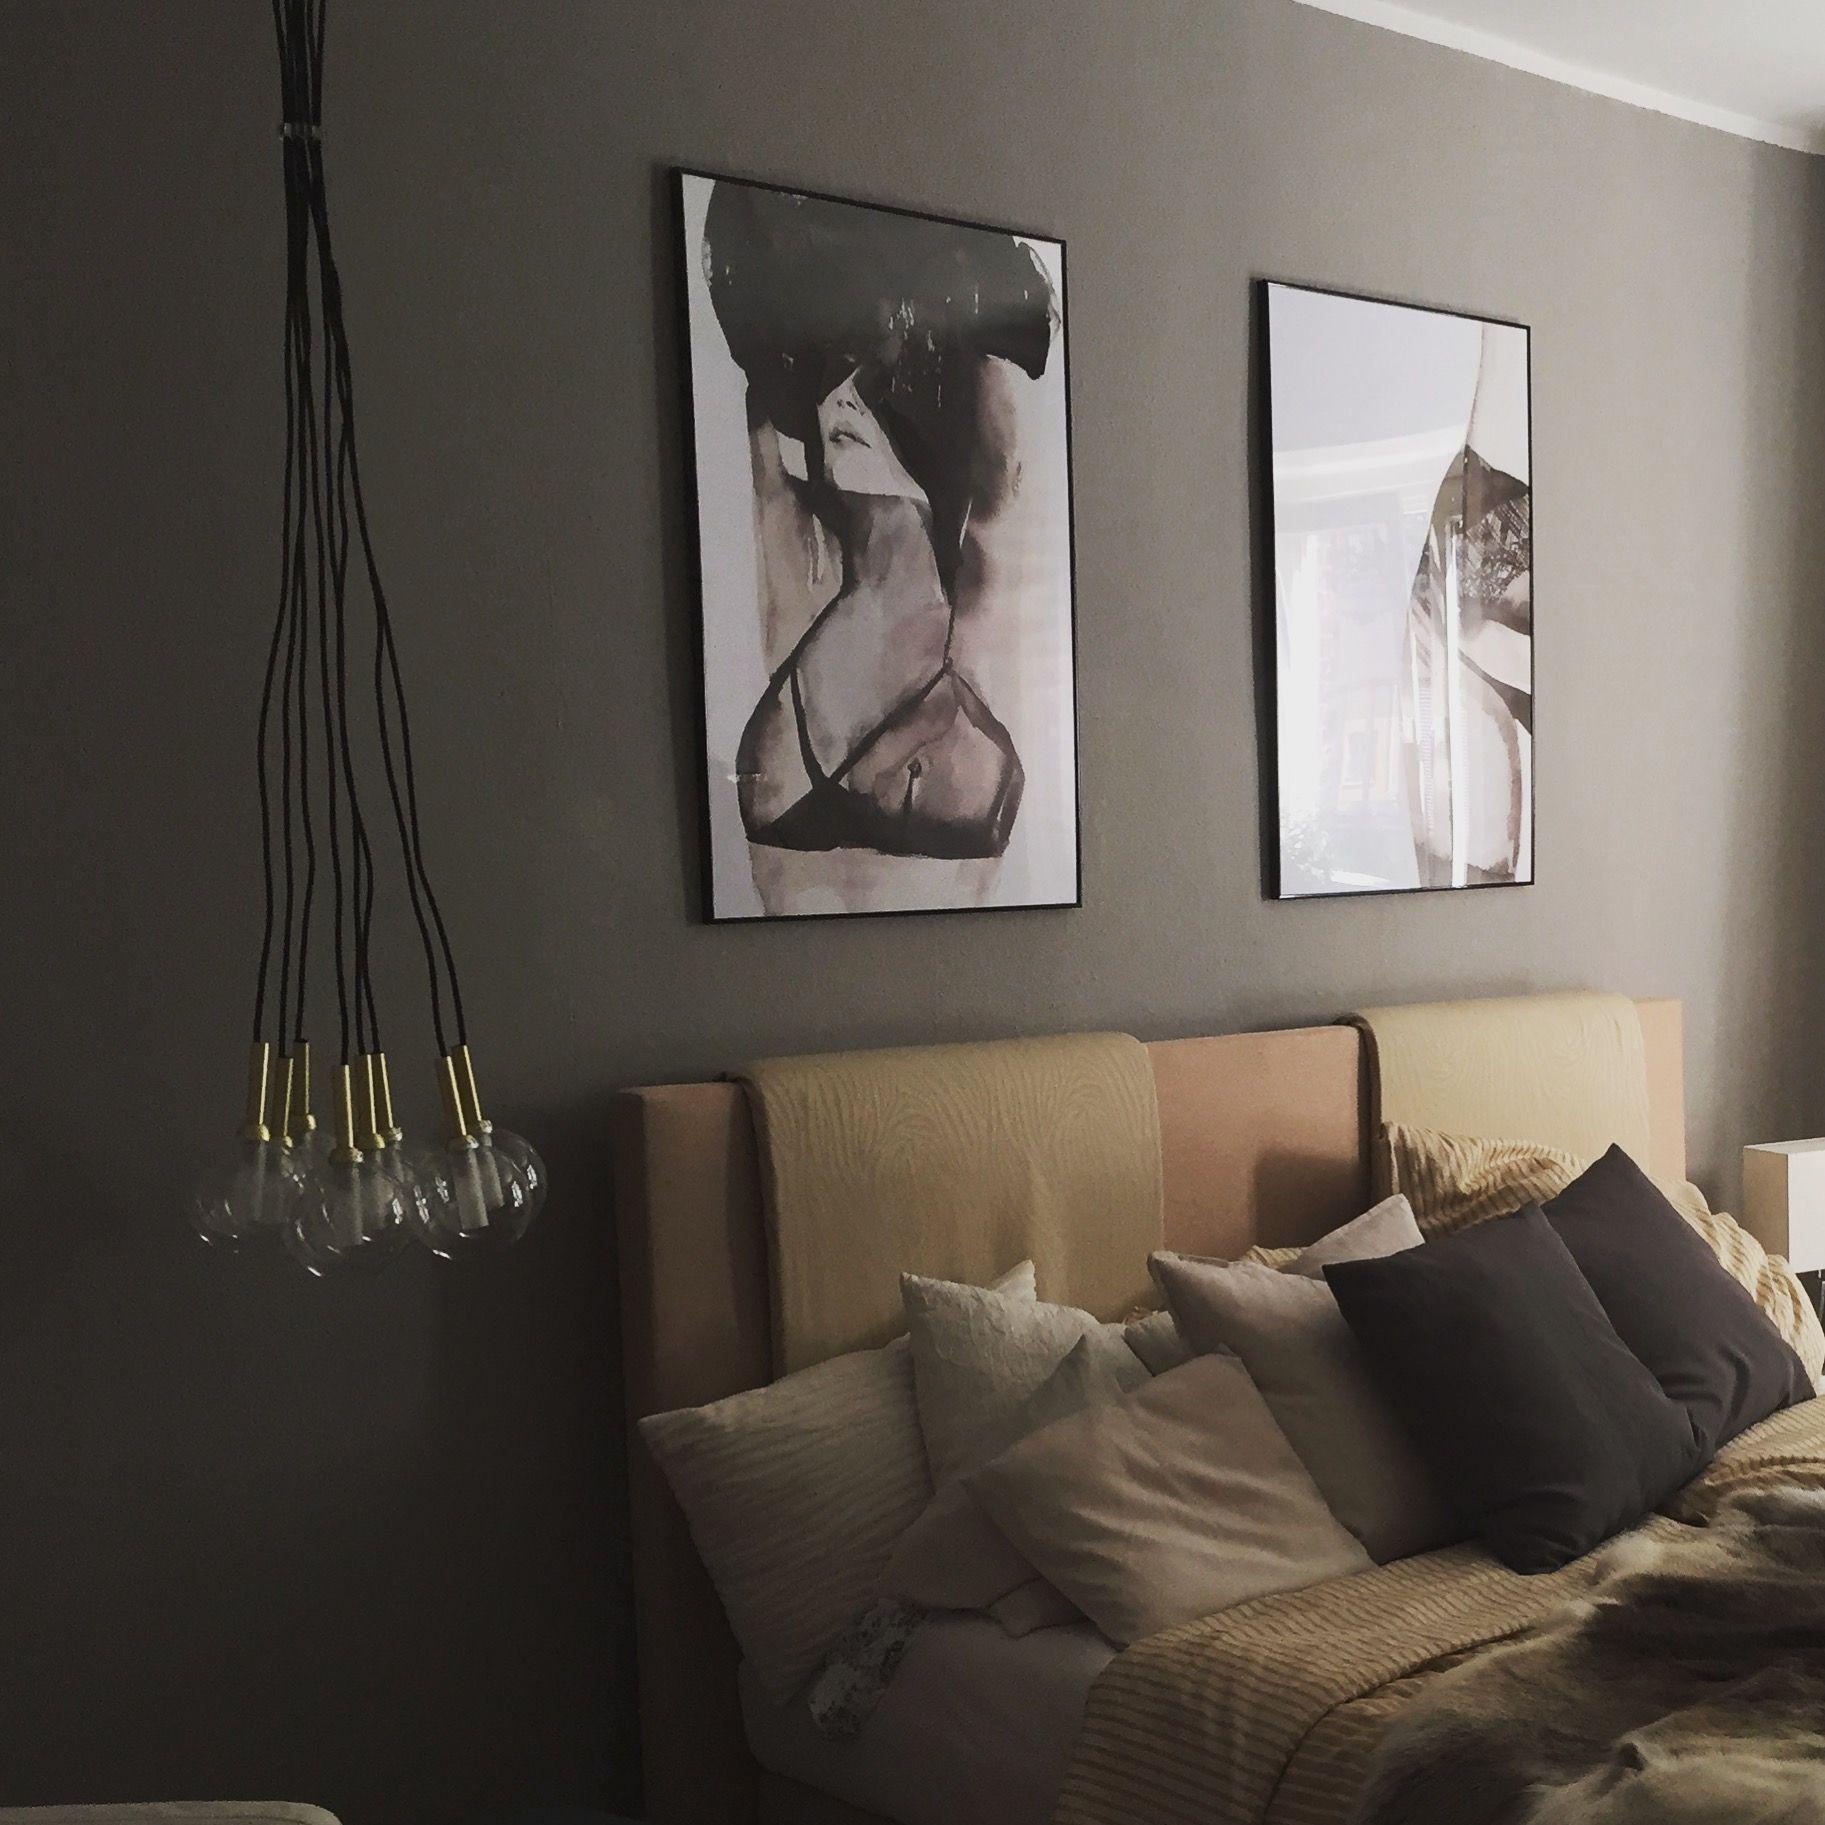 wandfarbe alpina d cher von paris alpina d cher von paris in 2019 wandfarbe wohnzimmer und. Black Bedroom Furniture Sets. Home Design Ideas